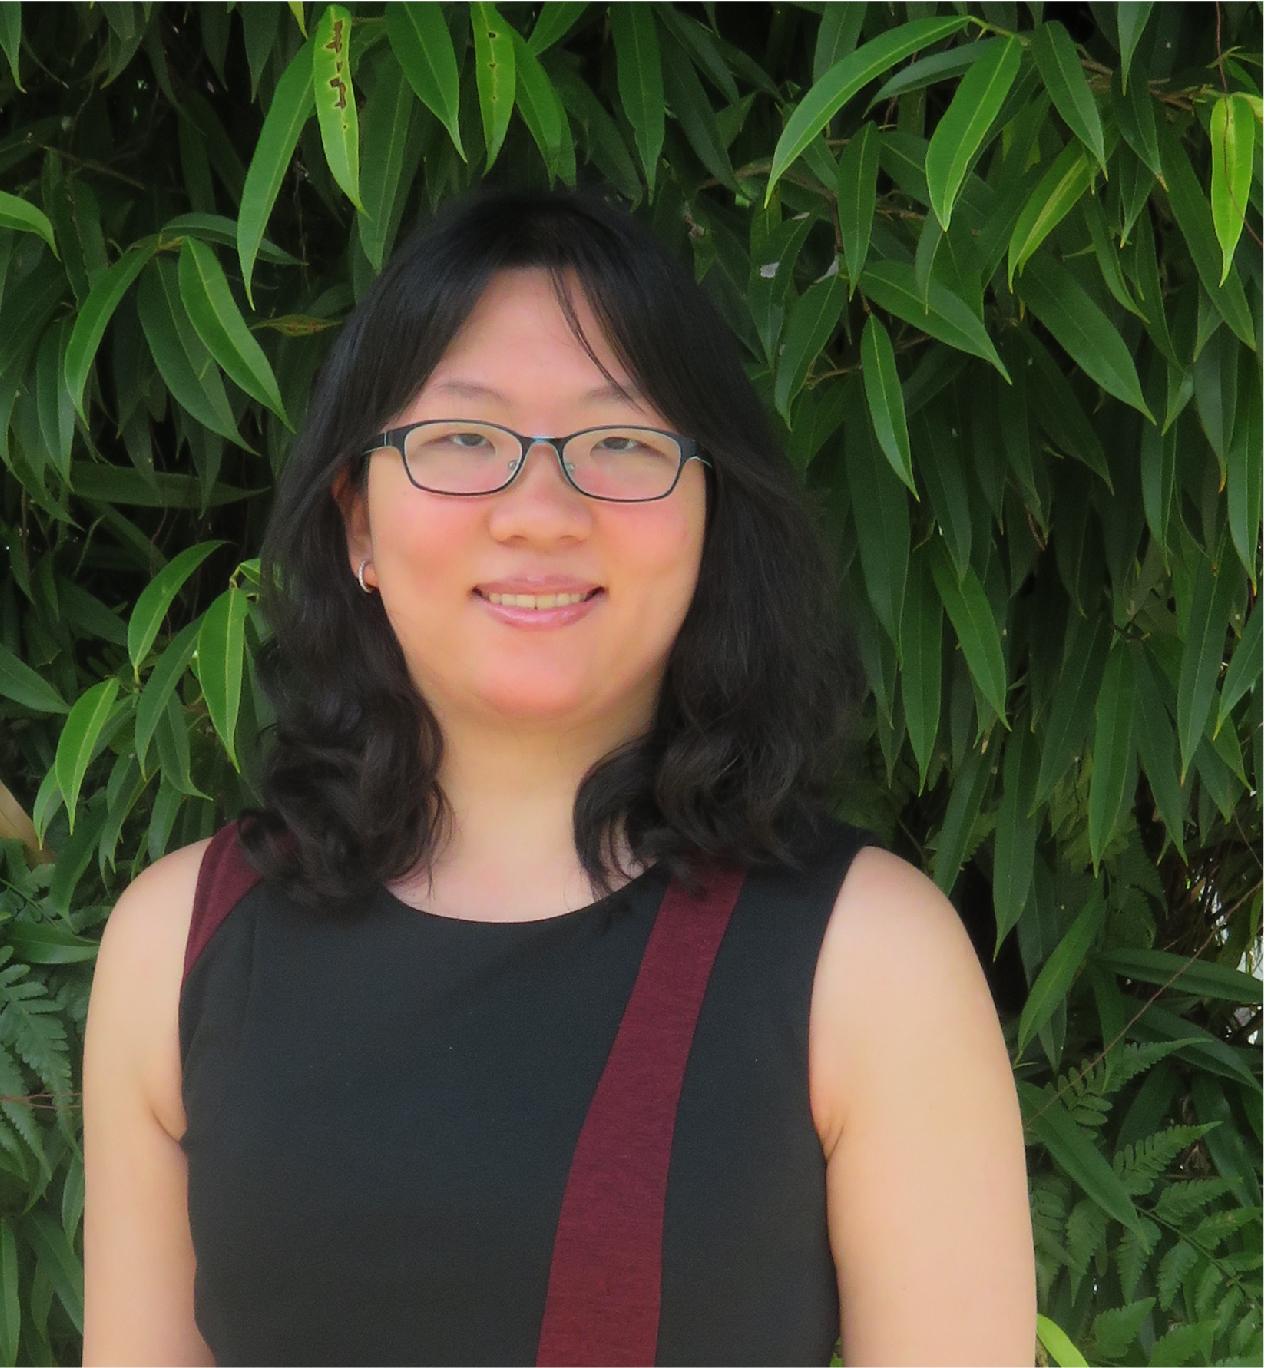 Kelly Liu Yiwen